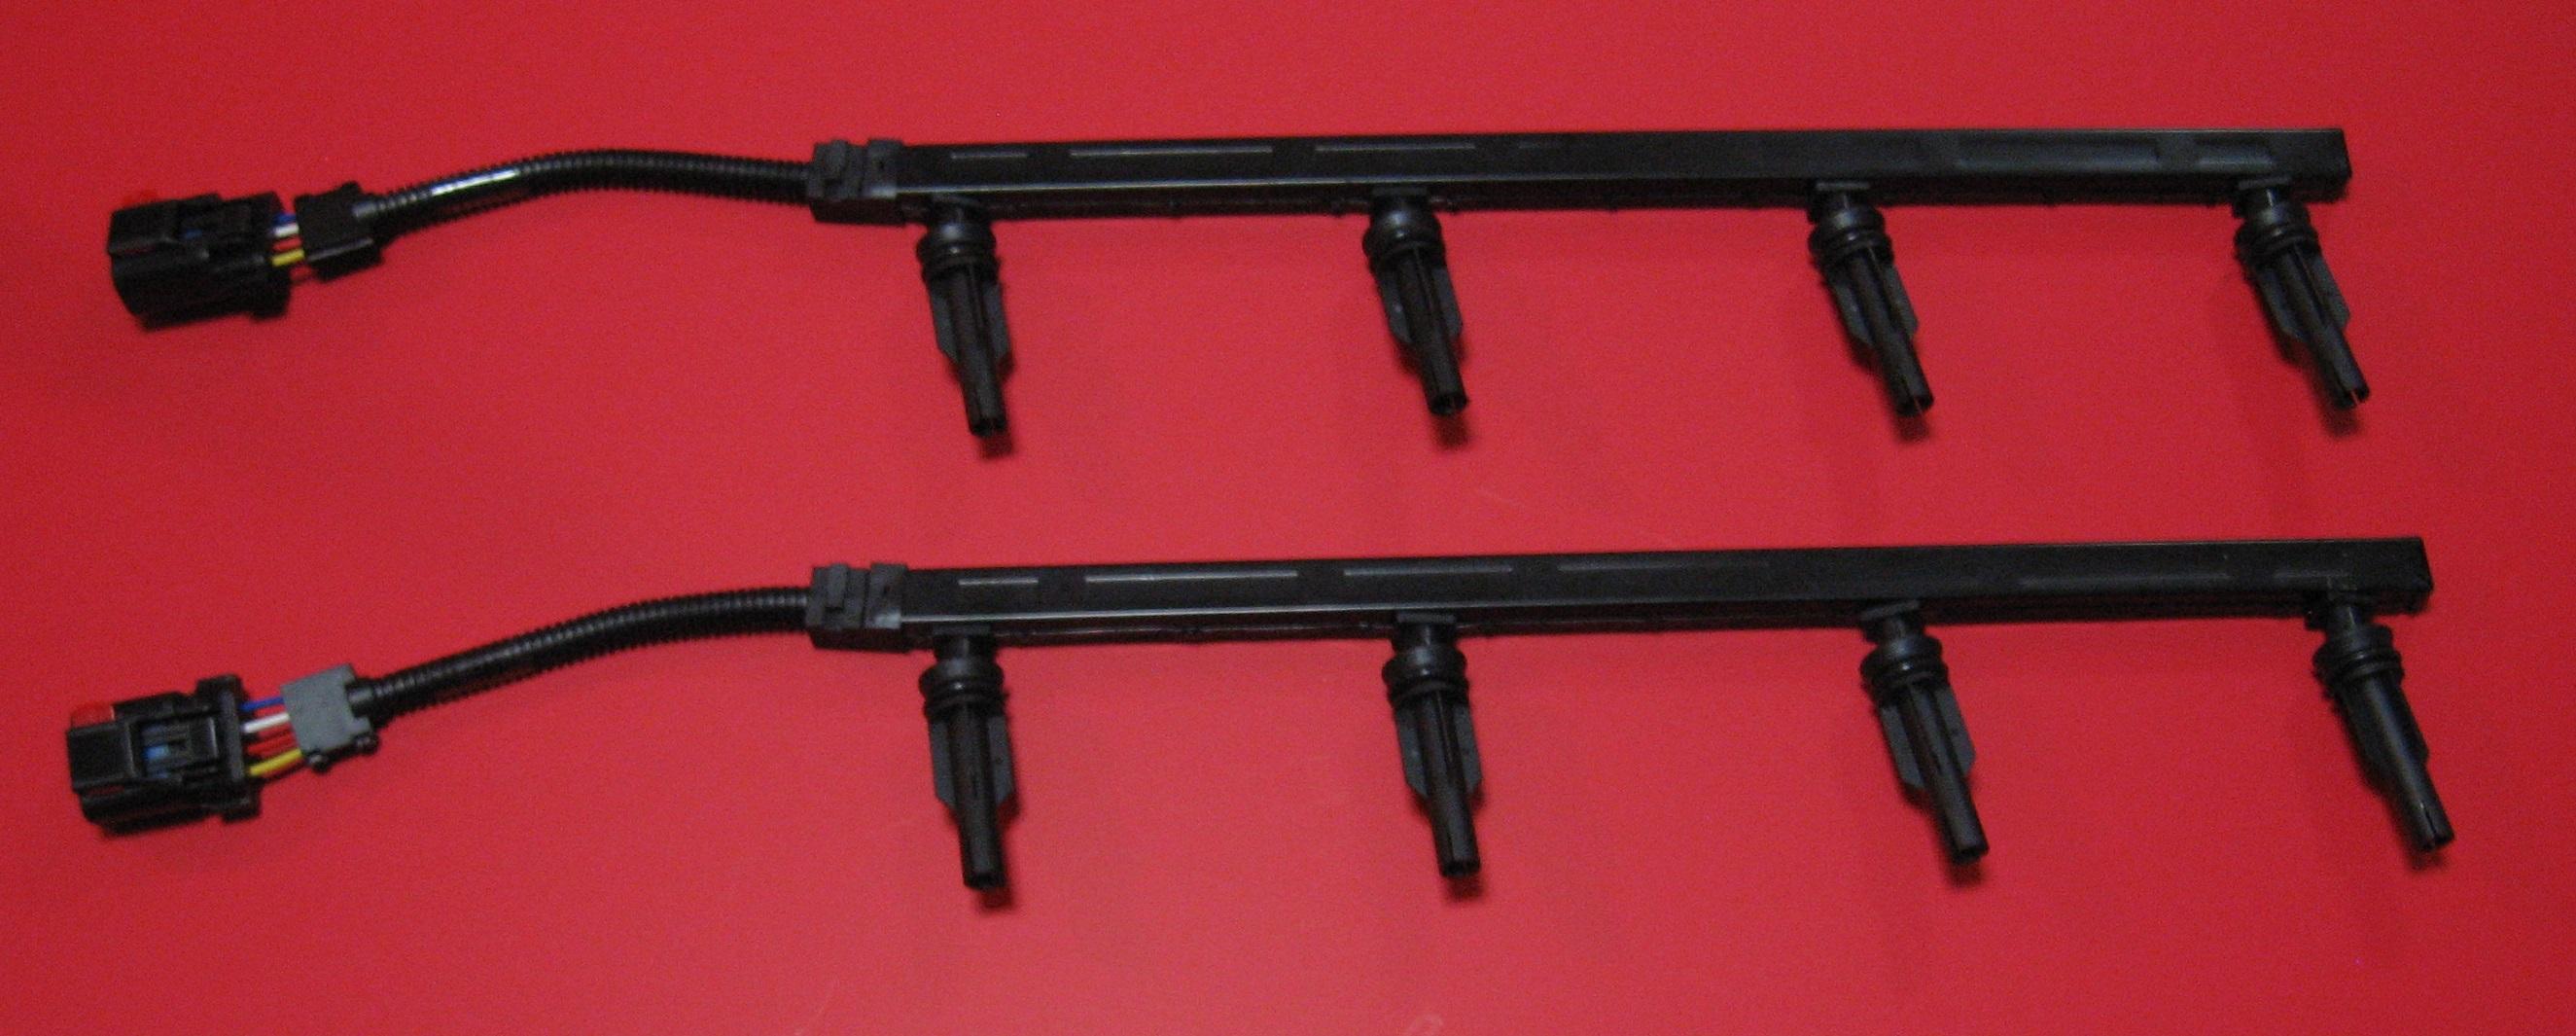 6.0L Early Glow Plug Harnesses ATS608?bh=250 powerstroke DIY Wiring Harness at soozxer.org